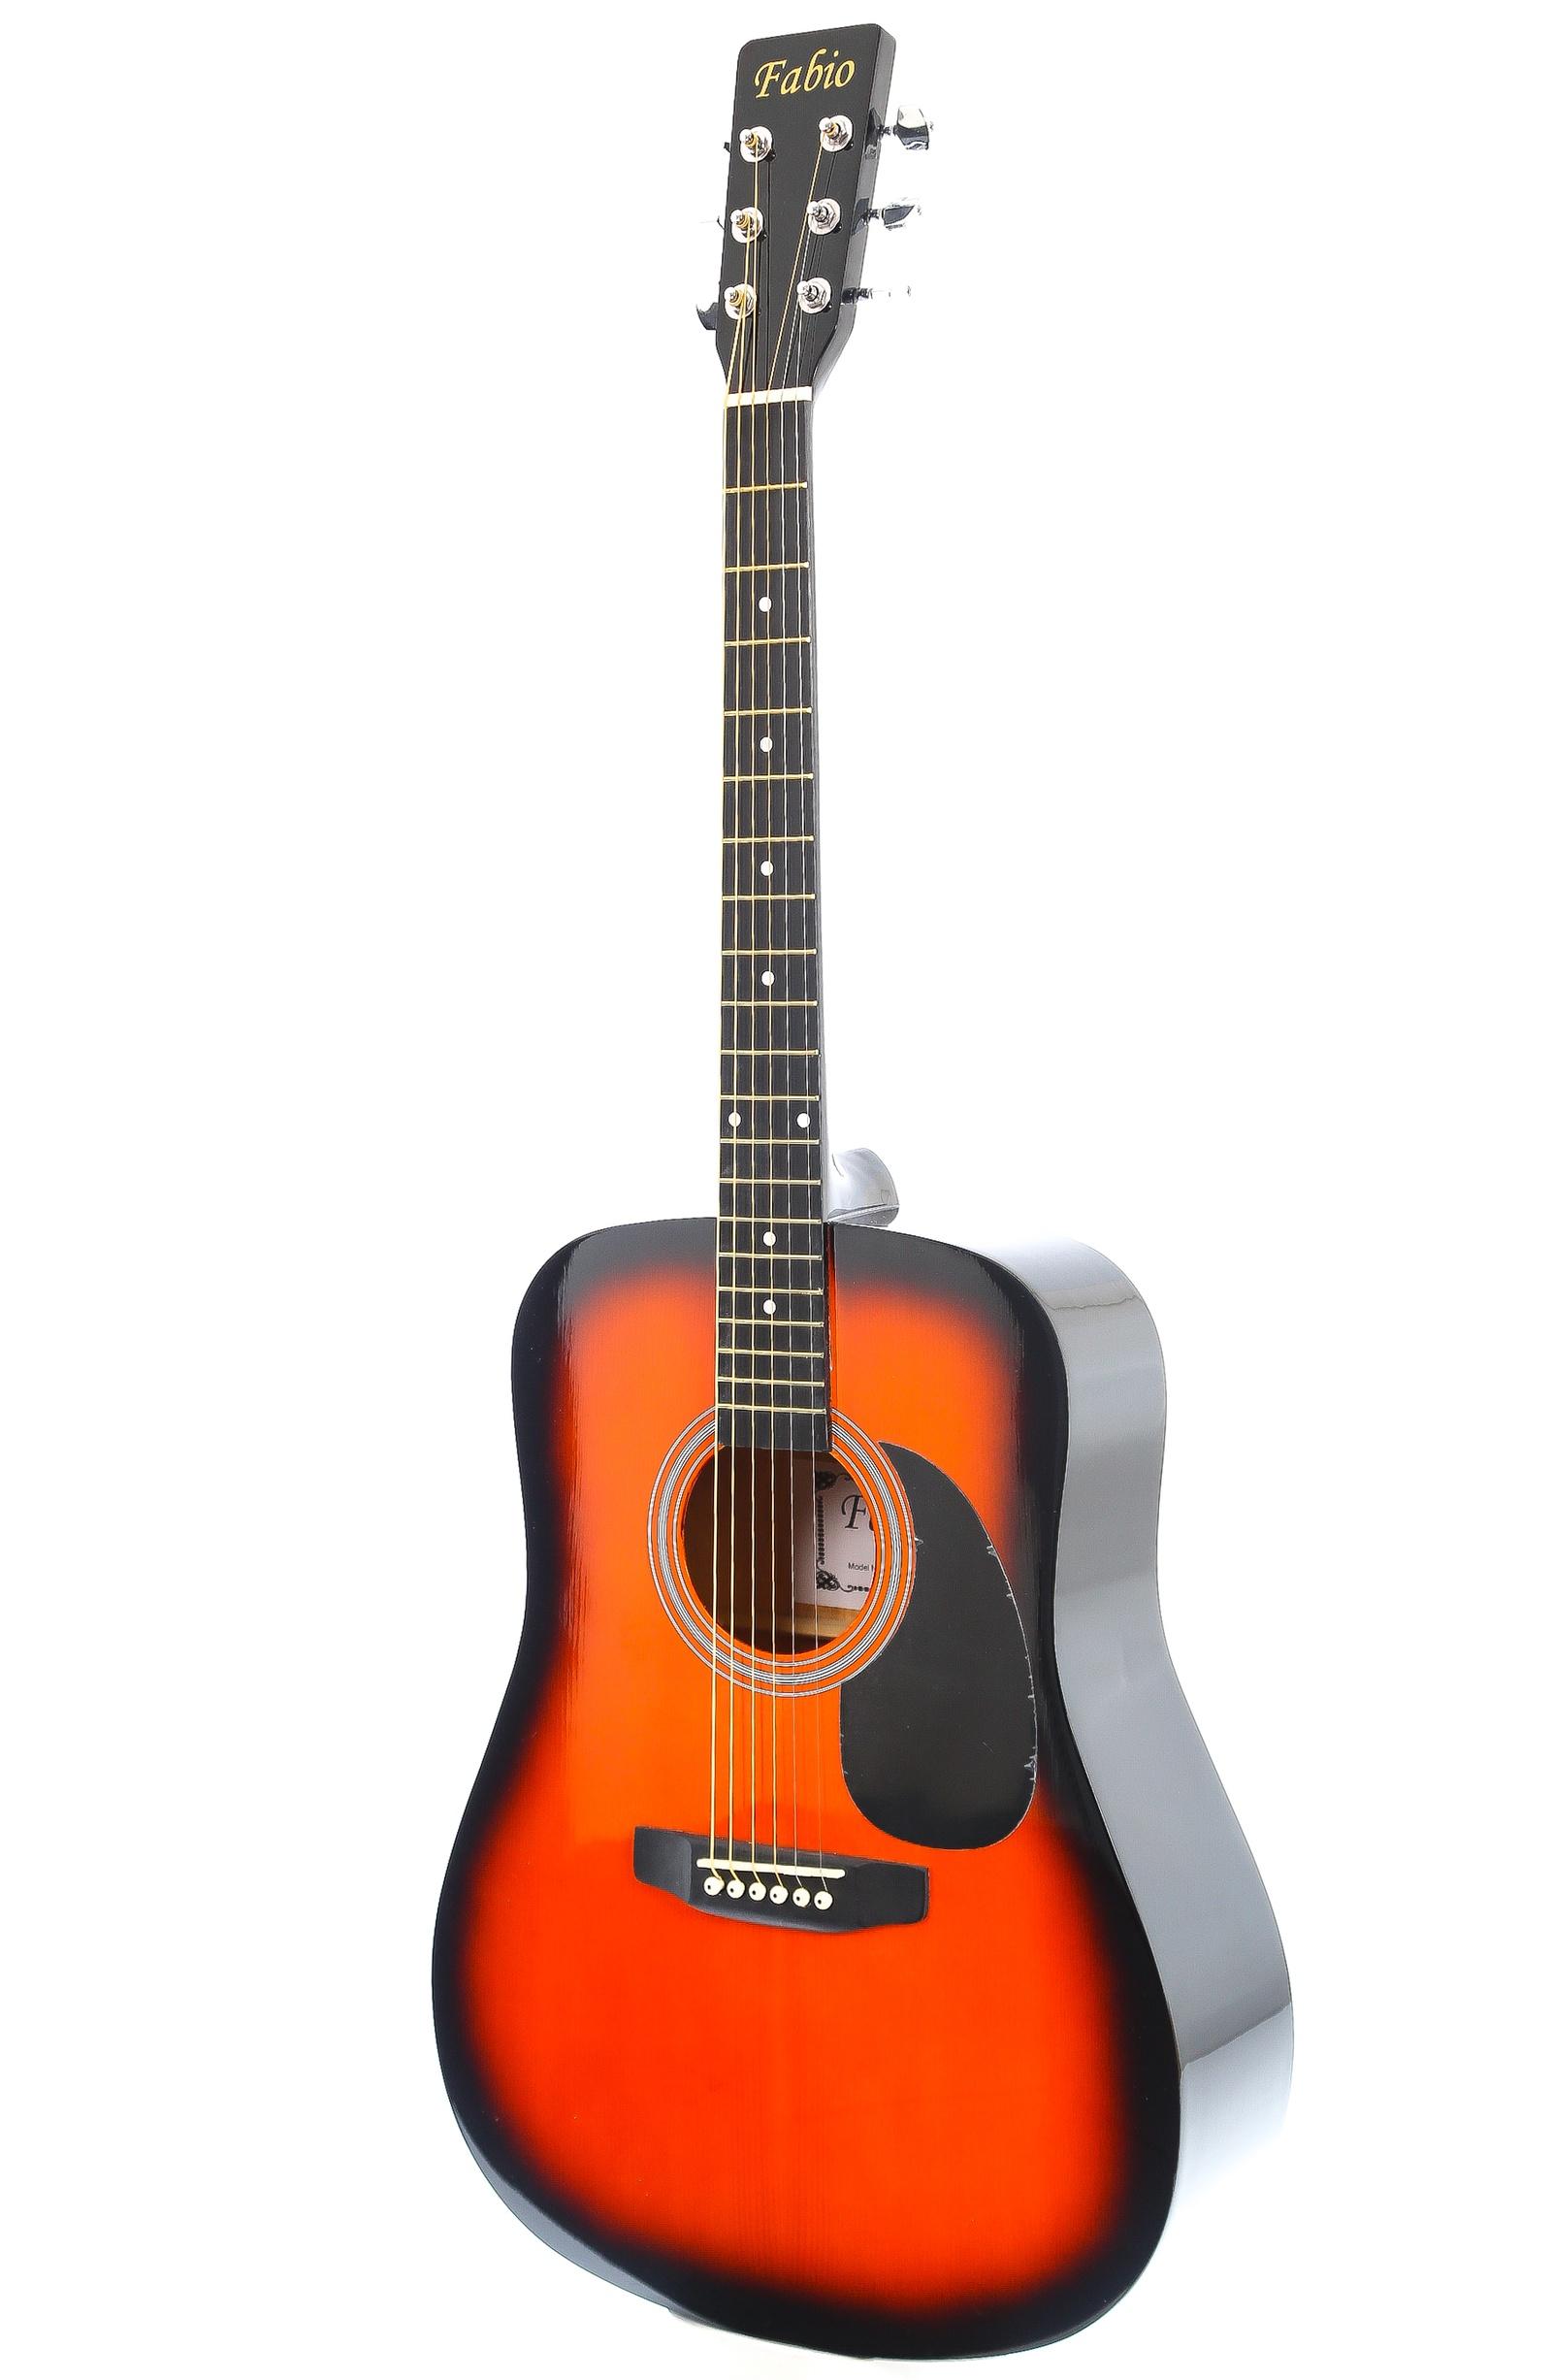 Fabio SA105, Yellow акустическая гитара veston c 45a bk акустическая гитара